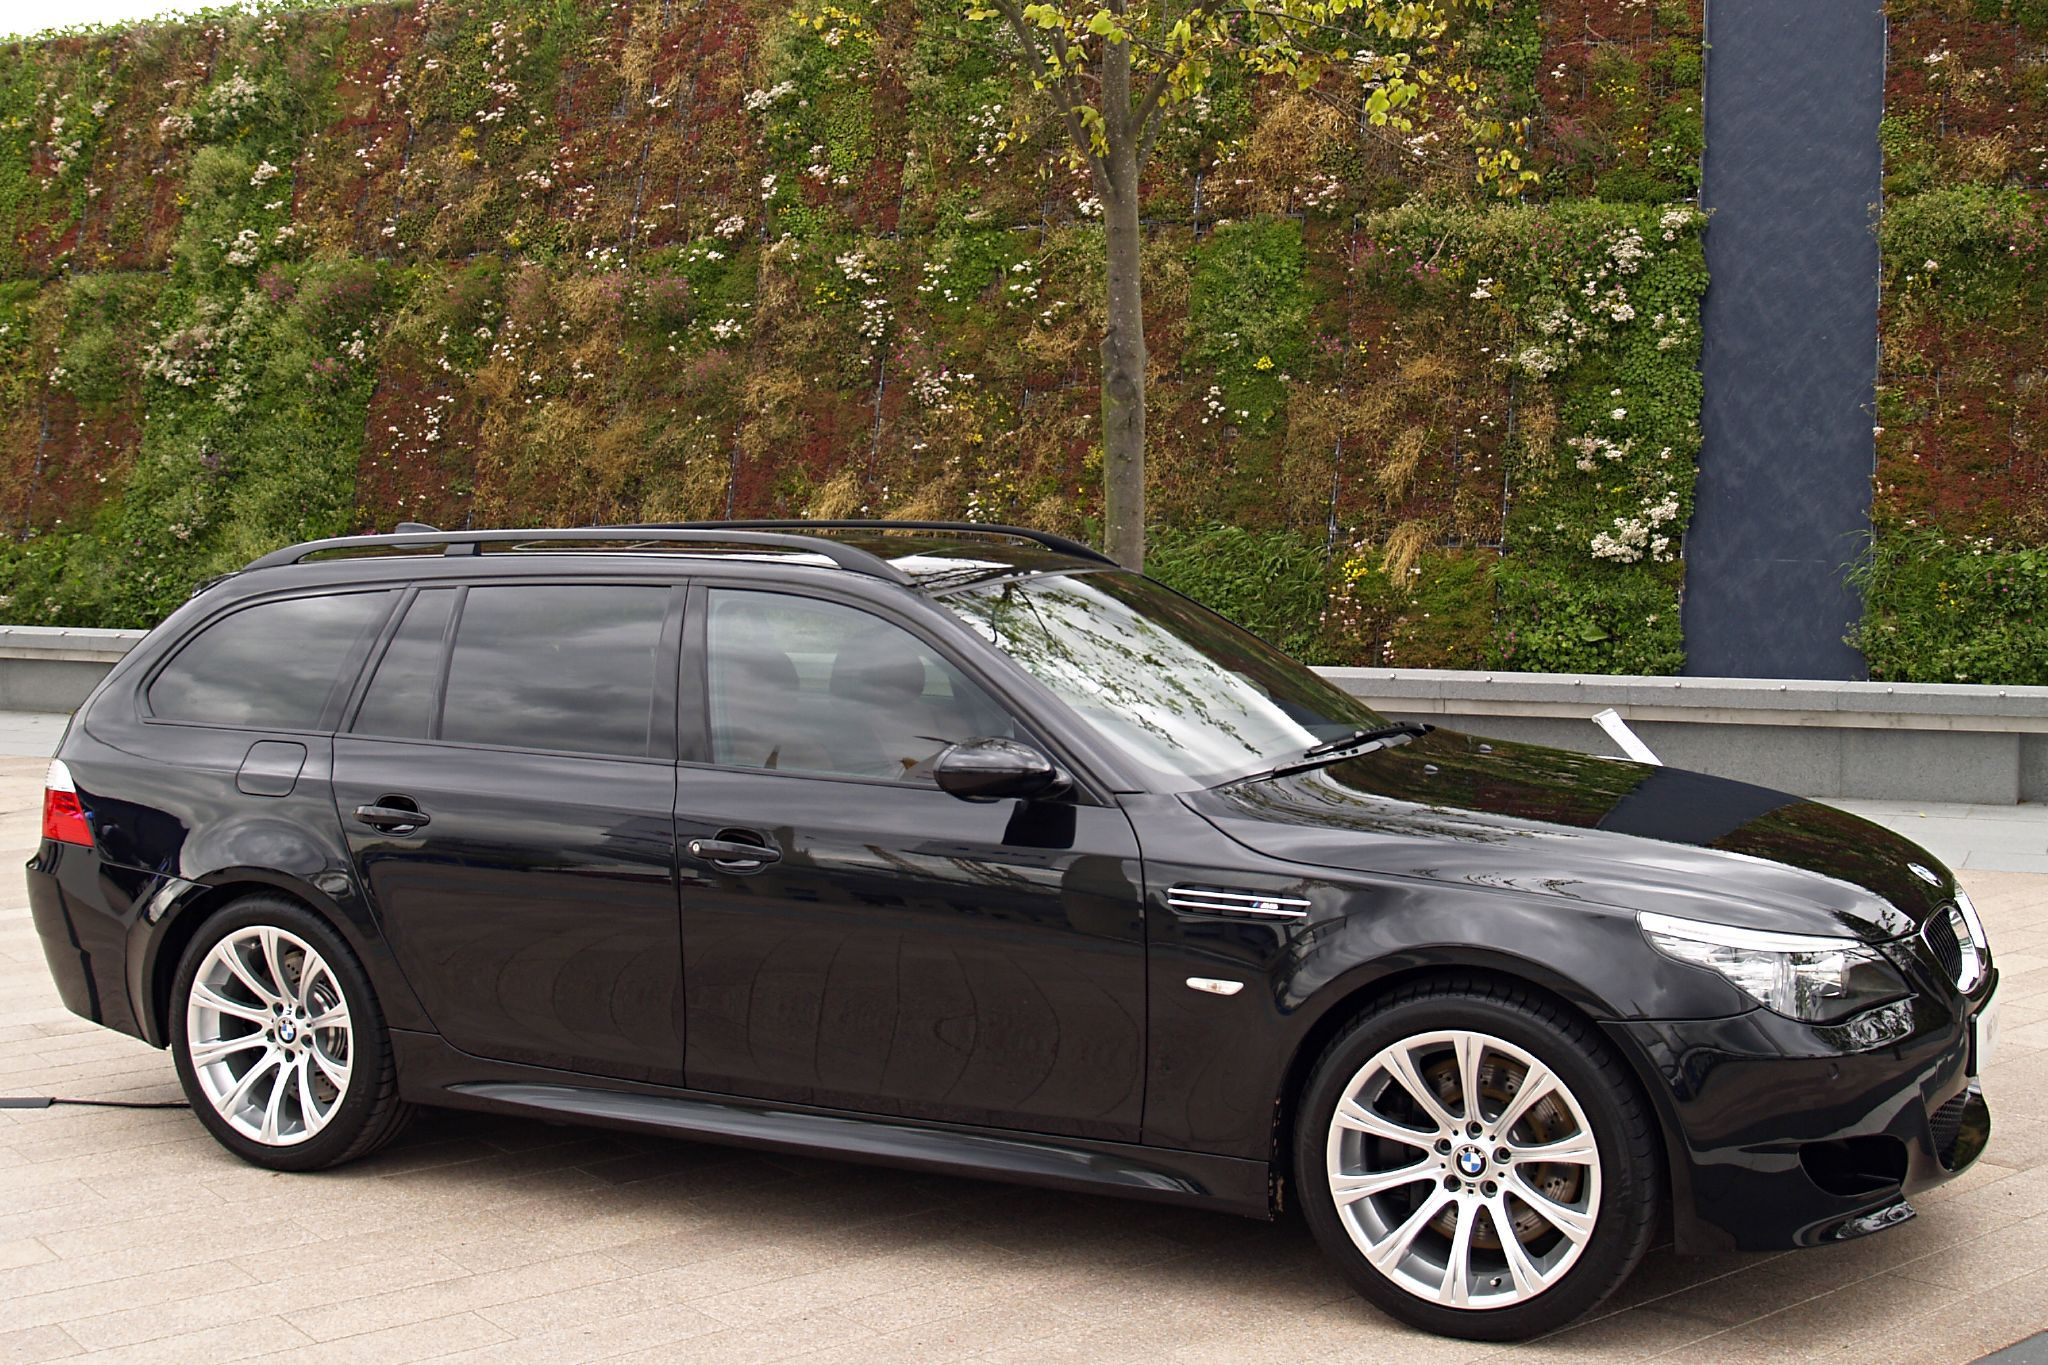 BMW M5 Touring, Black    Wondrous Wagons   Bmw, Bmw m5